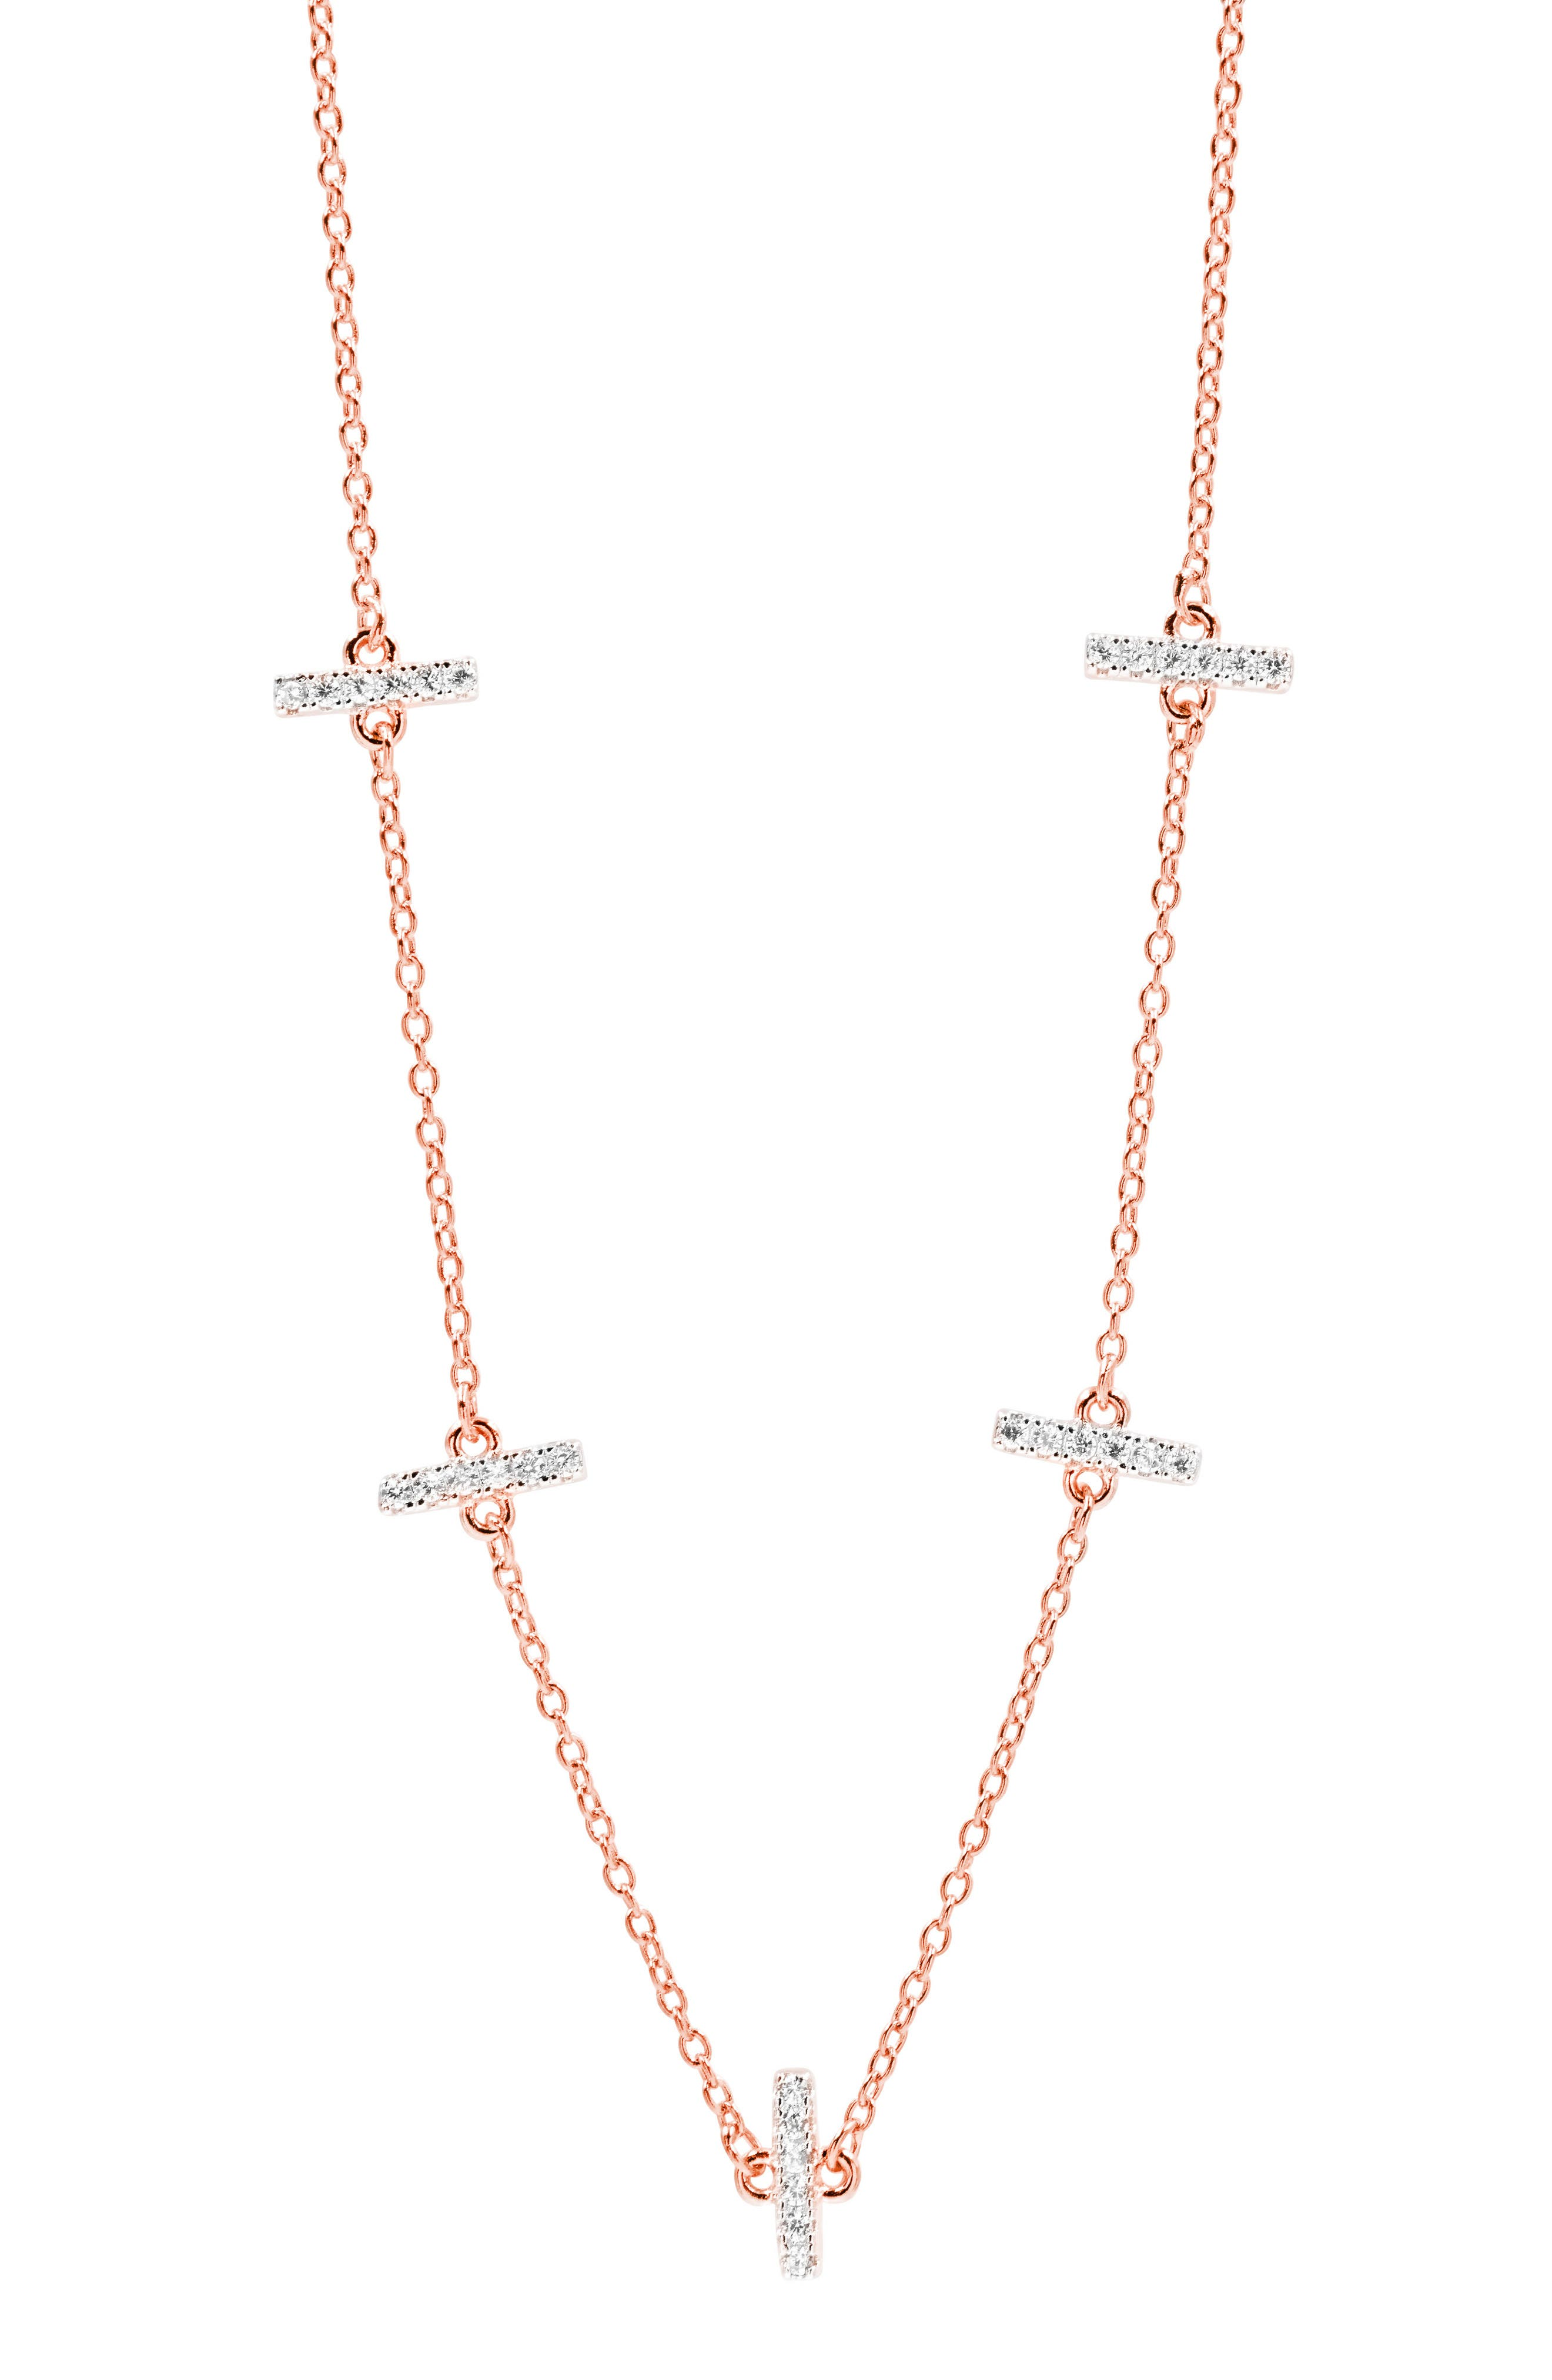 FREIDA ROTHMAN Radiance Crystal Station Necklace